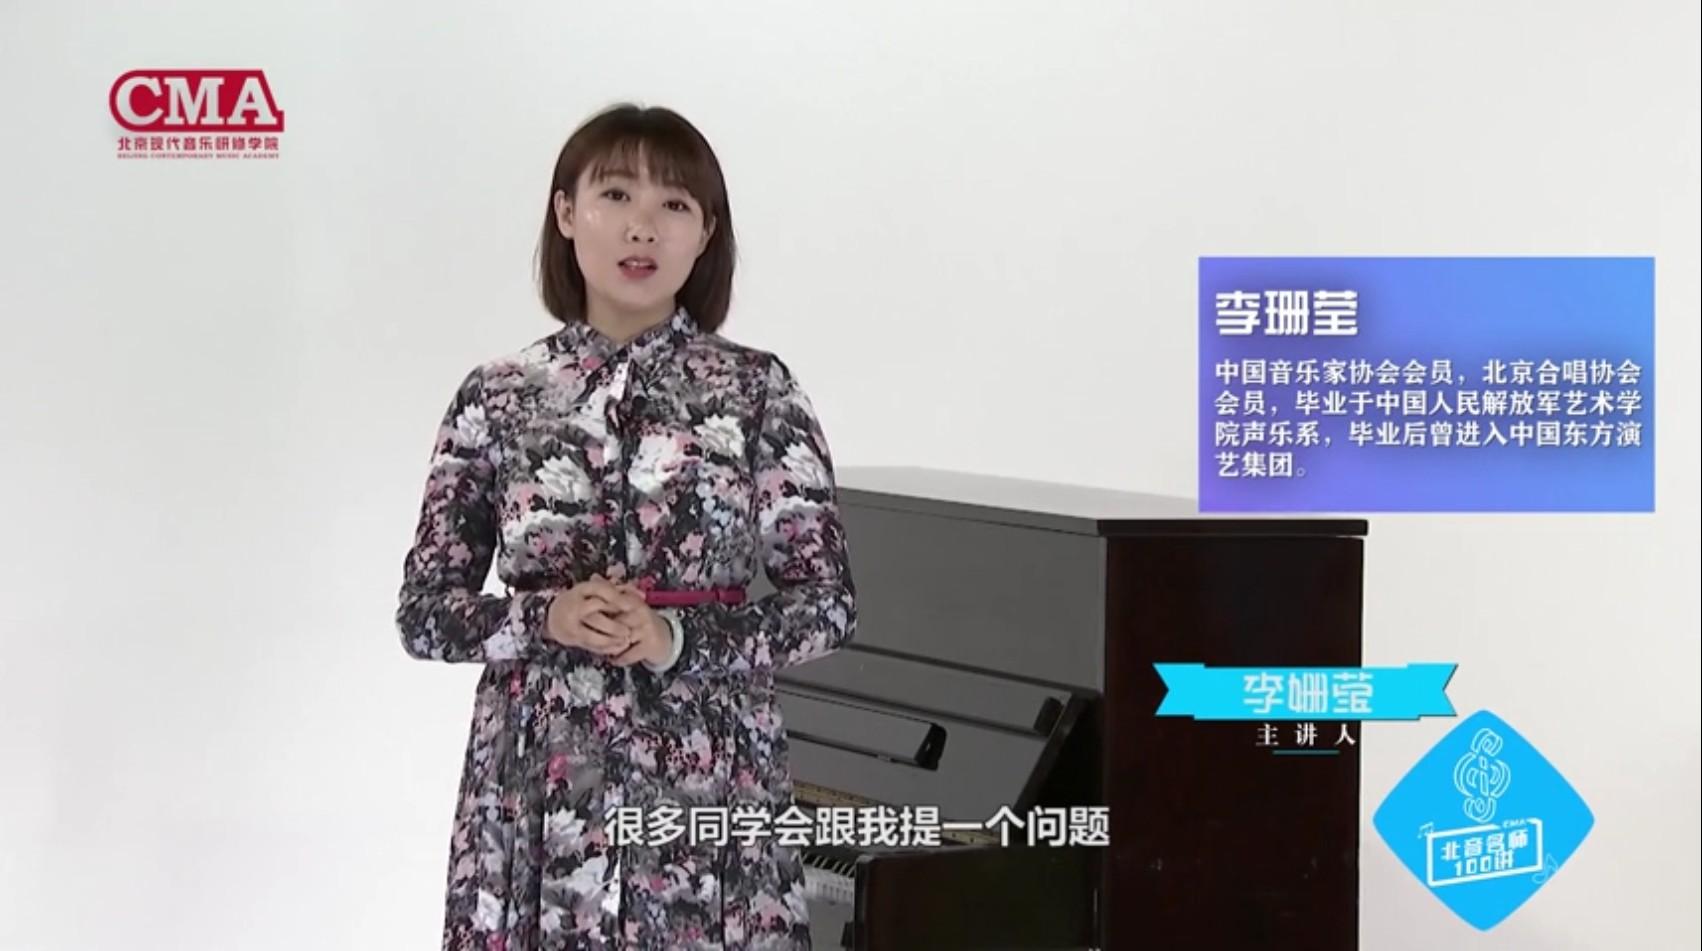 【bbin名师100讲】李珊莹:随着声音强弱的变化可以增强情感的抒发